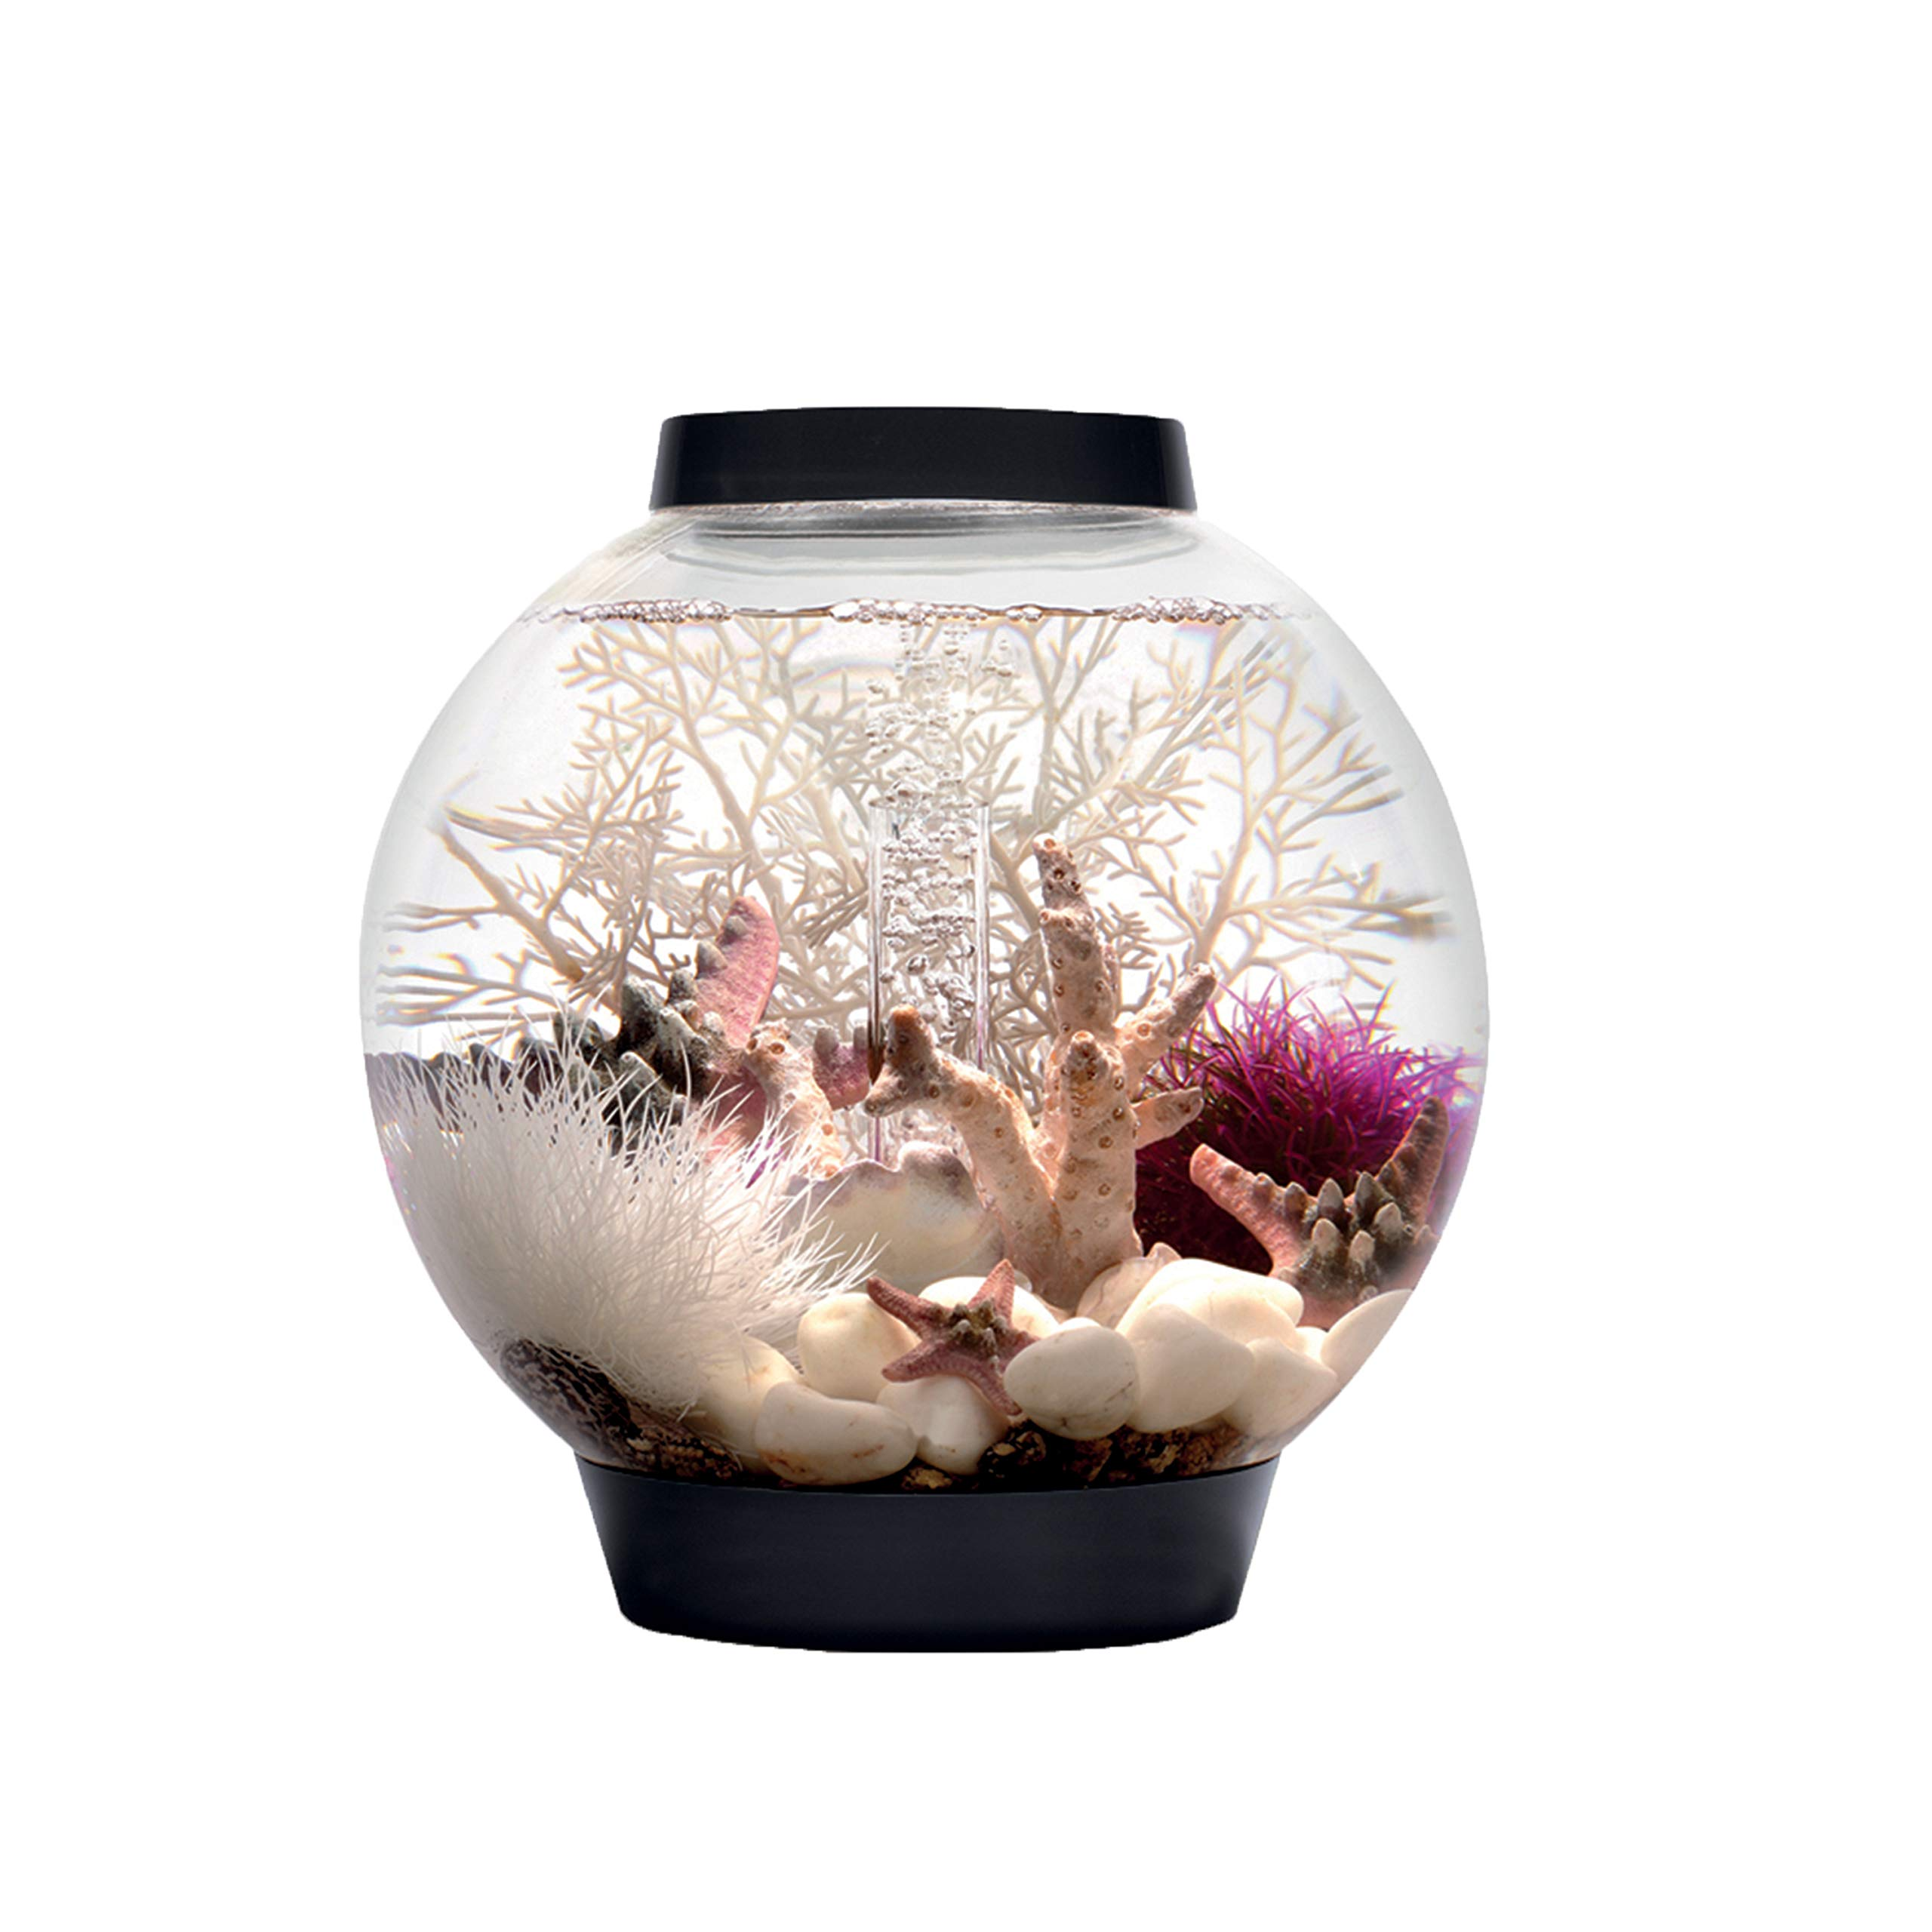 biOrb CLASSIC 15 Aquarium with LED - 4 gallon, Black by biOrb